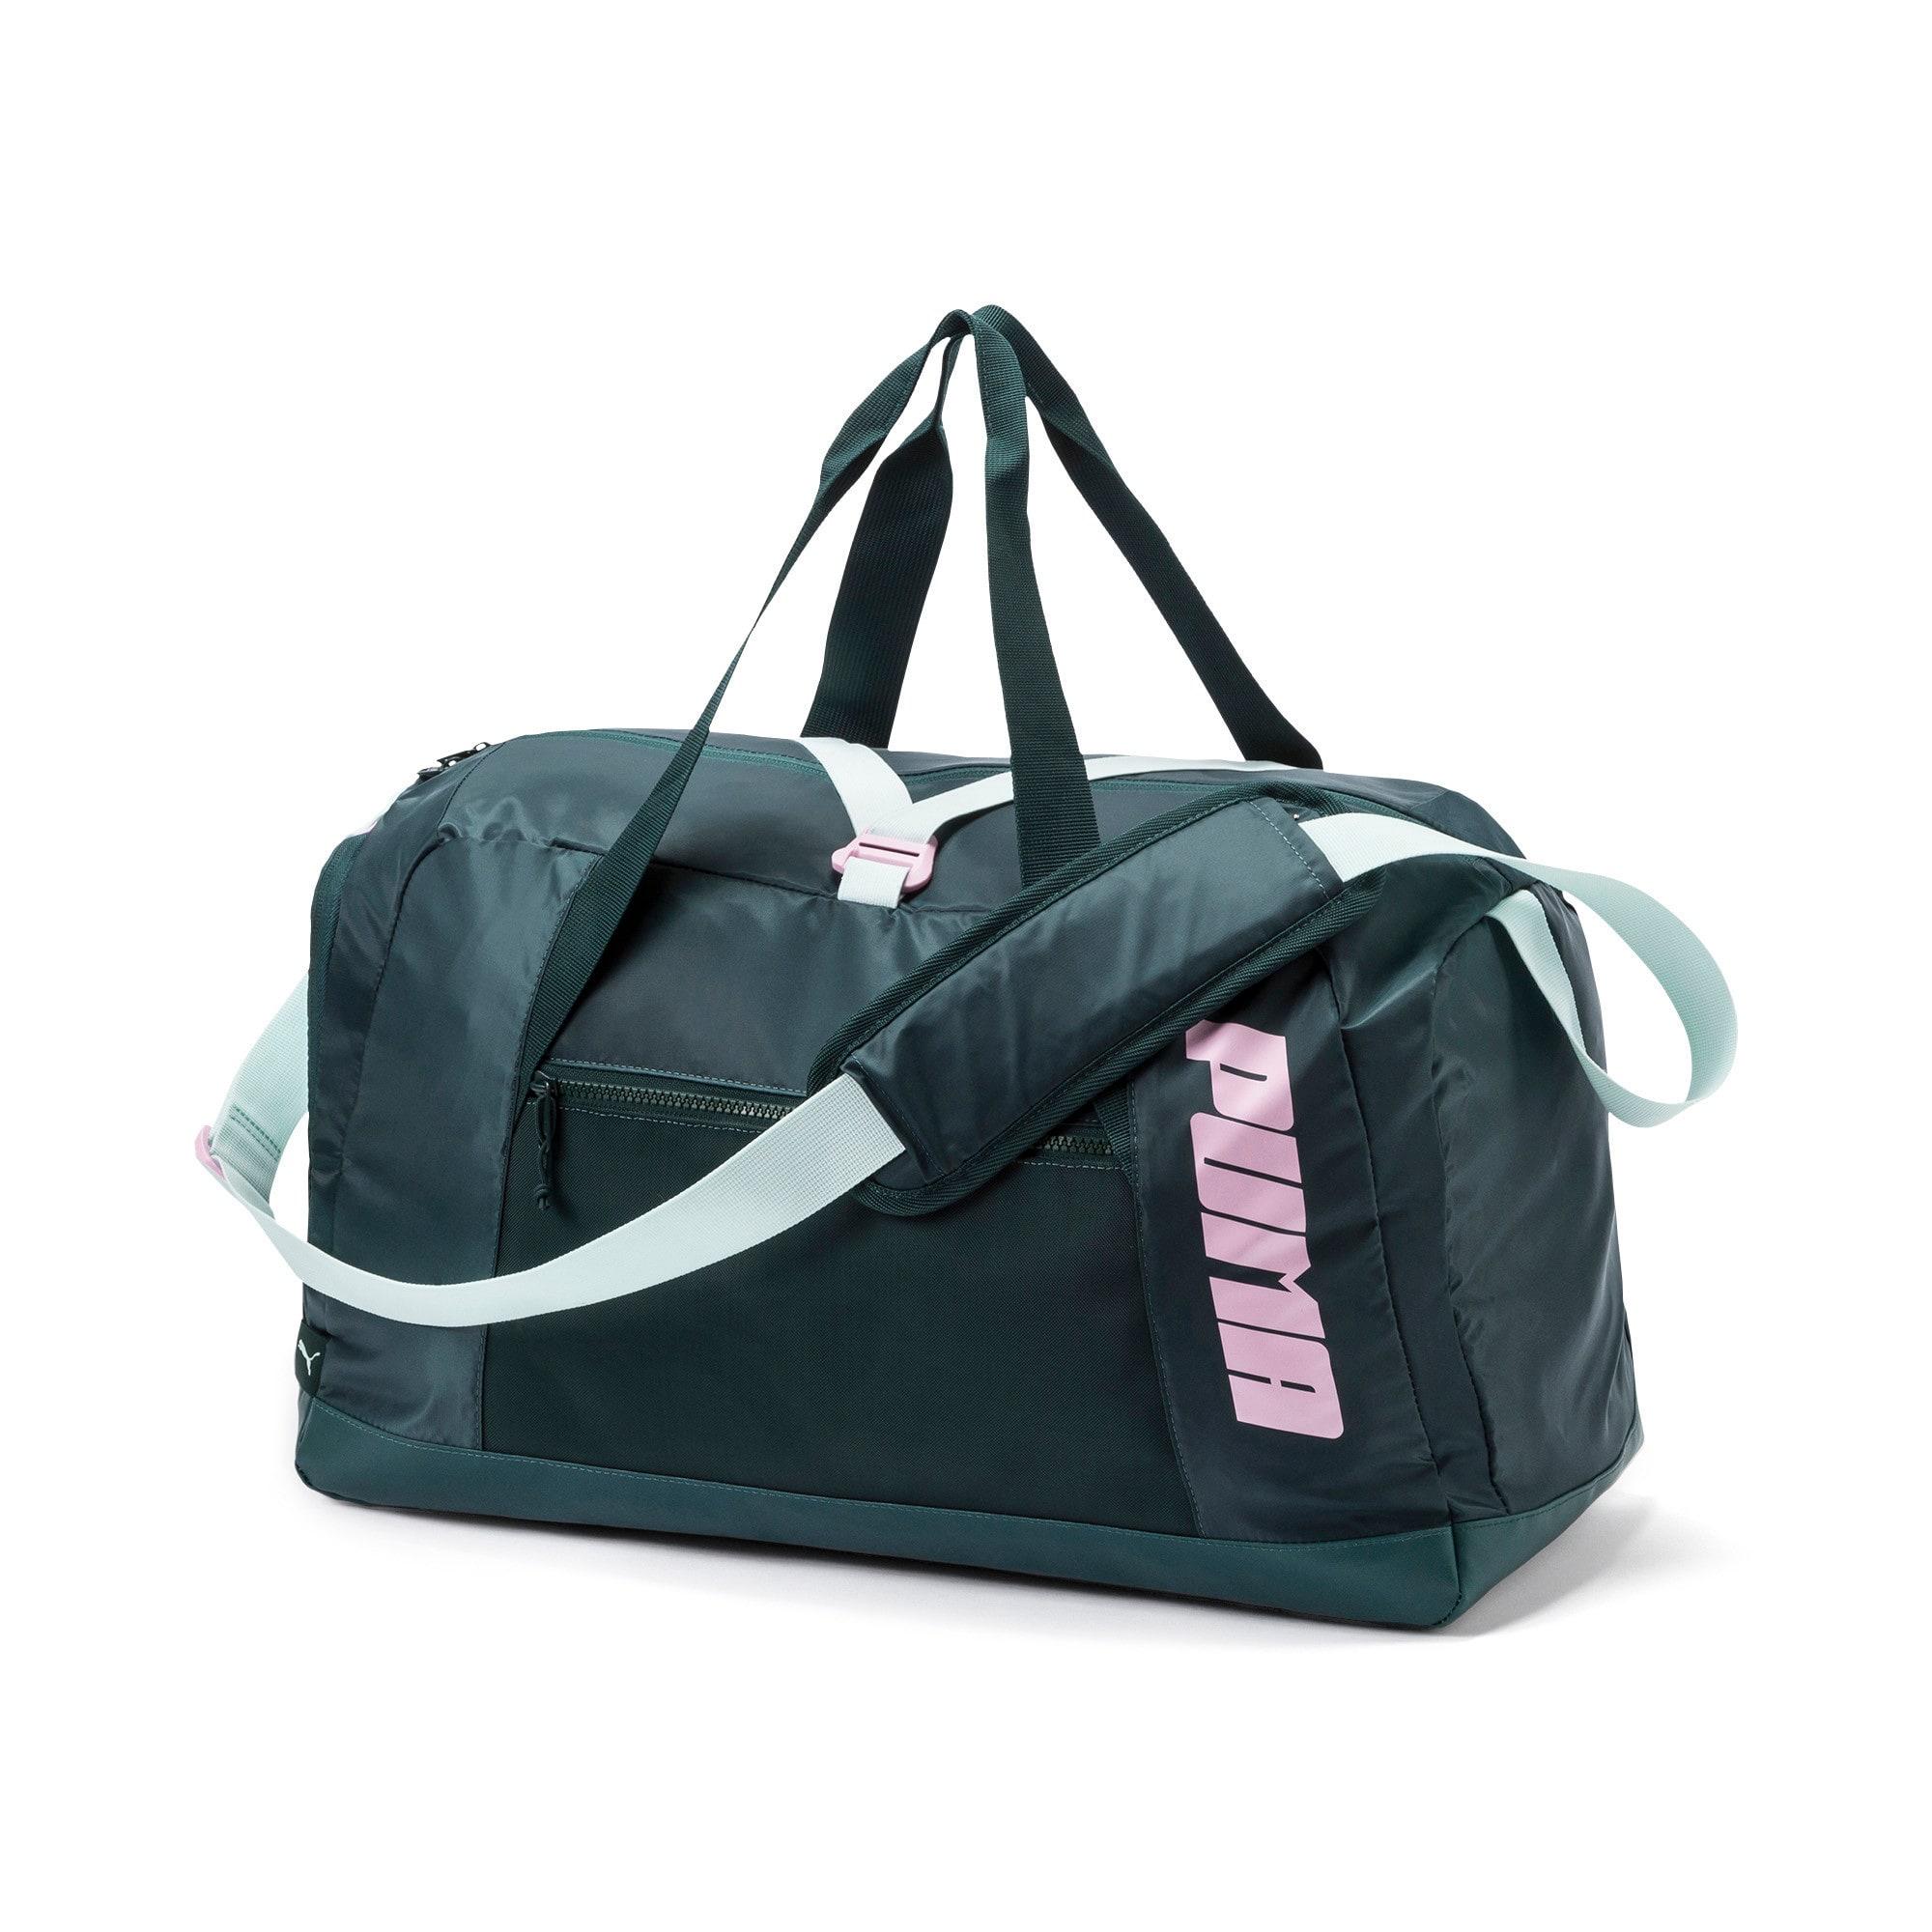 Thumbnail 1 of Active Women's Training Duffle Bag, Ponderosa Pine, medium